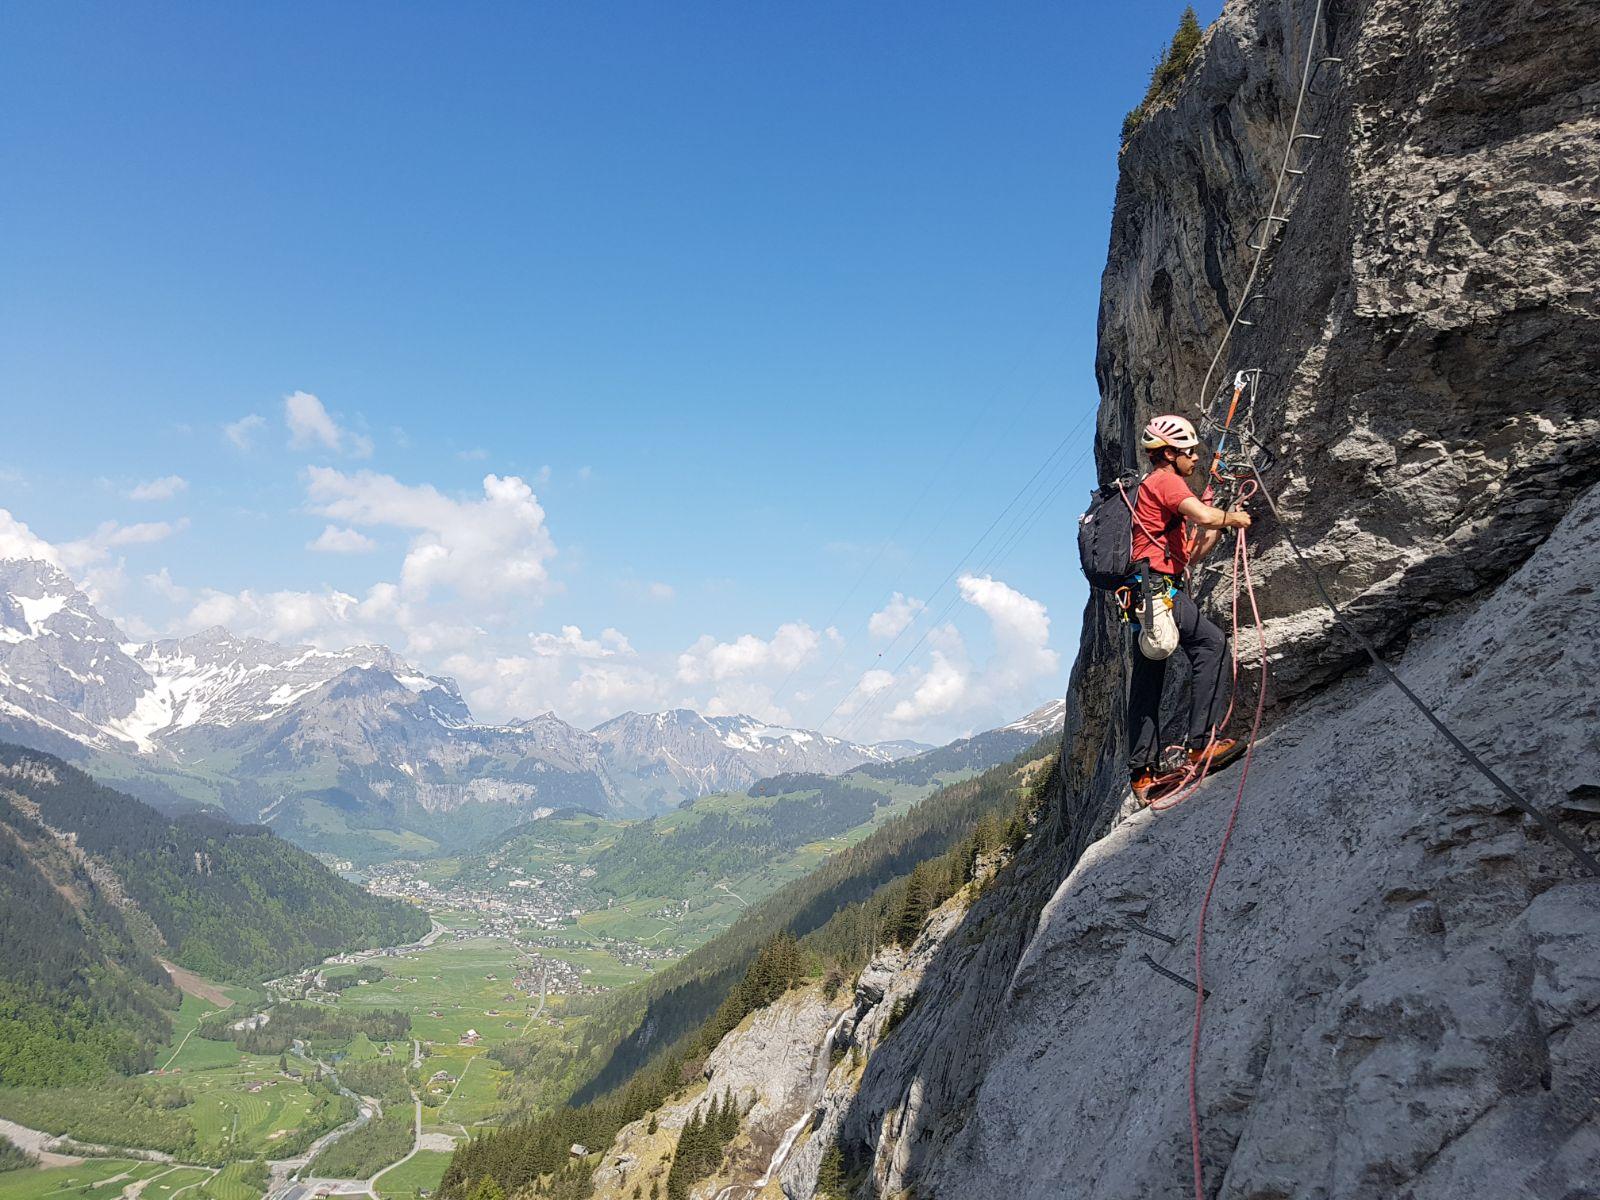 Klettersteig Fürenwand : Klettersteig fürenwand geöffnet u engelberg mountain guide